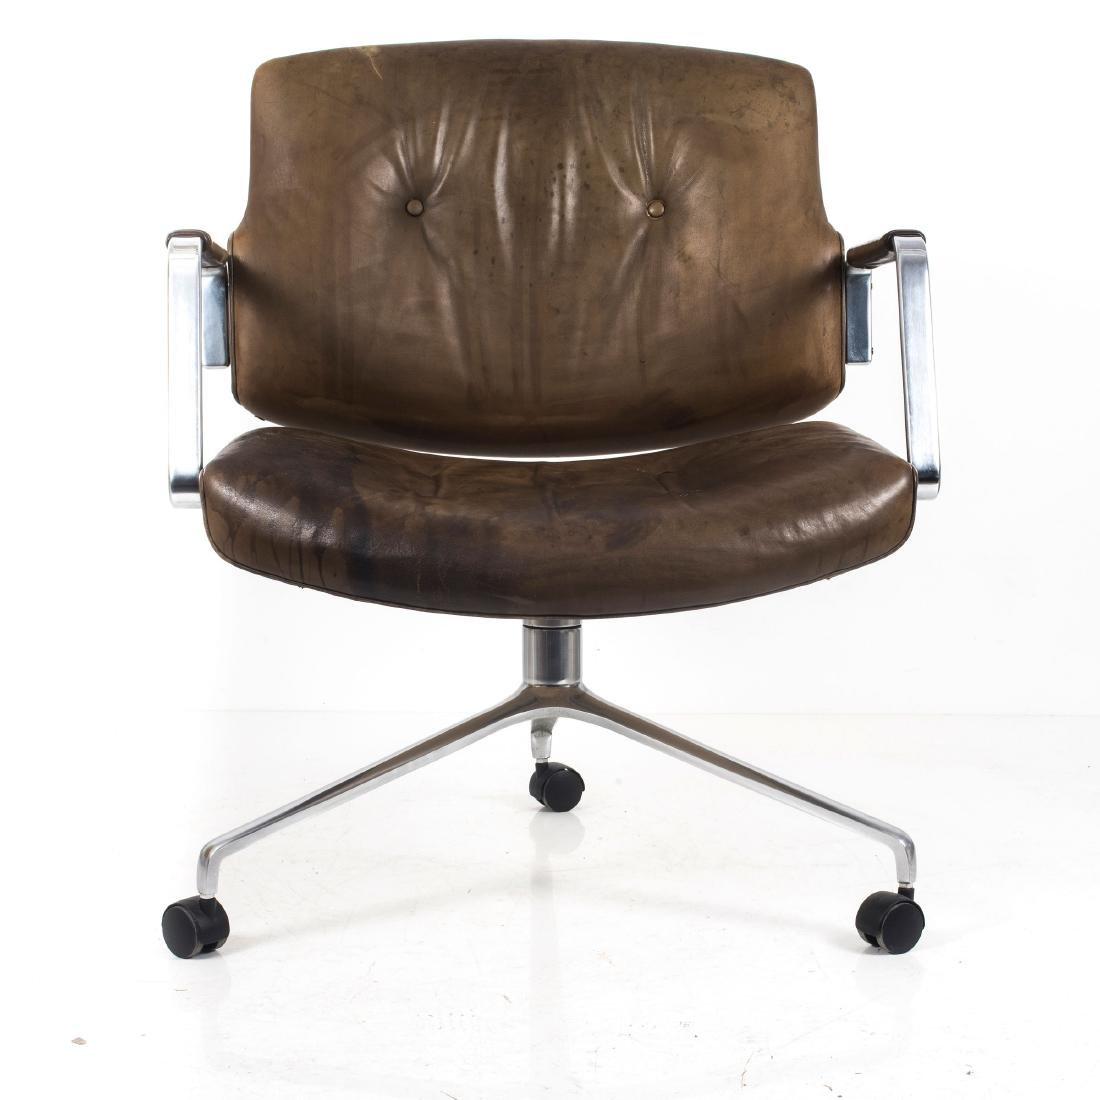 'DK-2' armchair, c. 1965 - 4